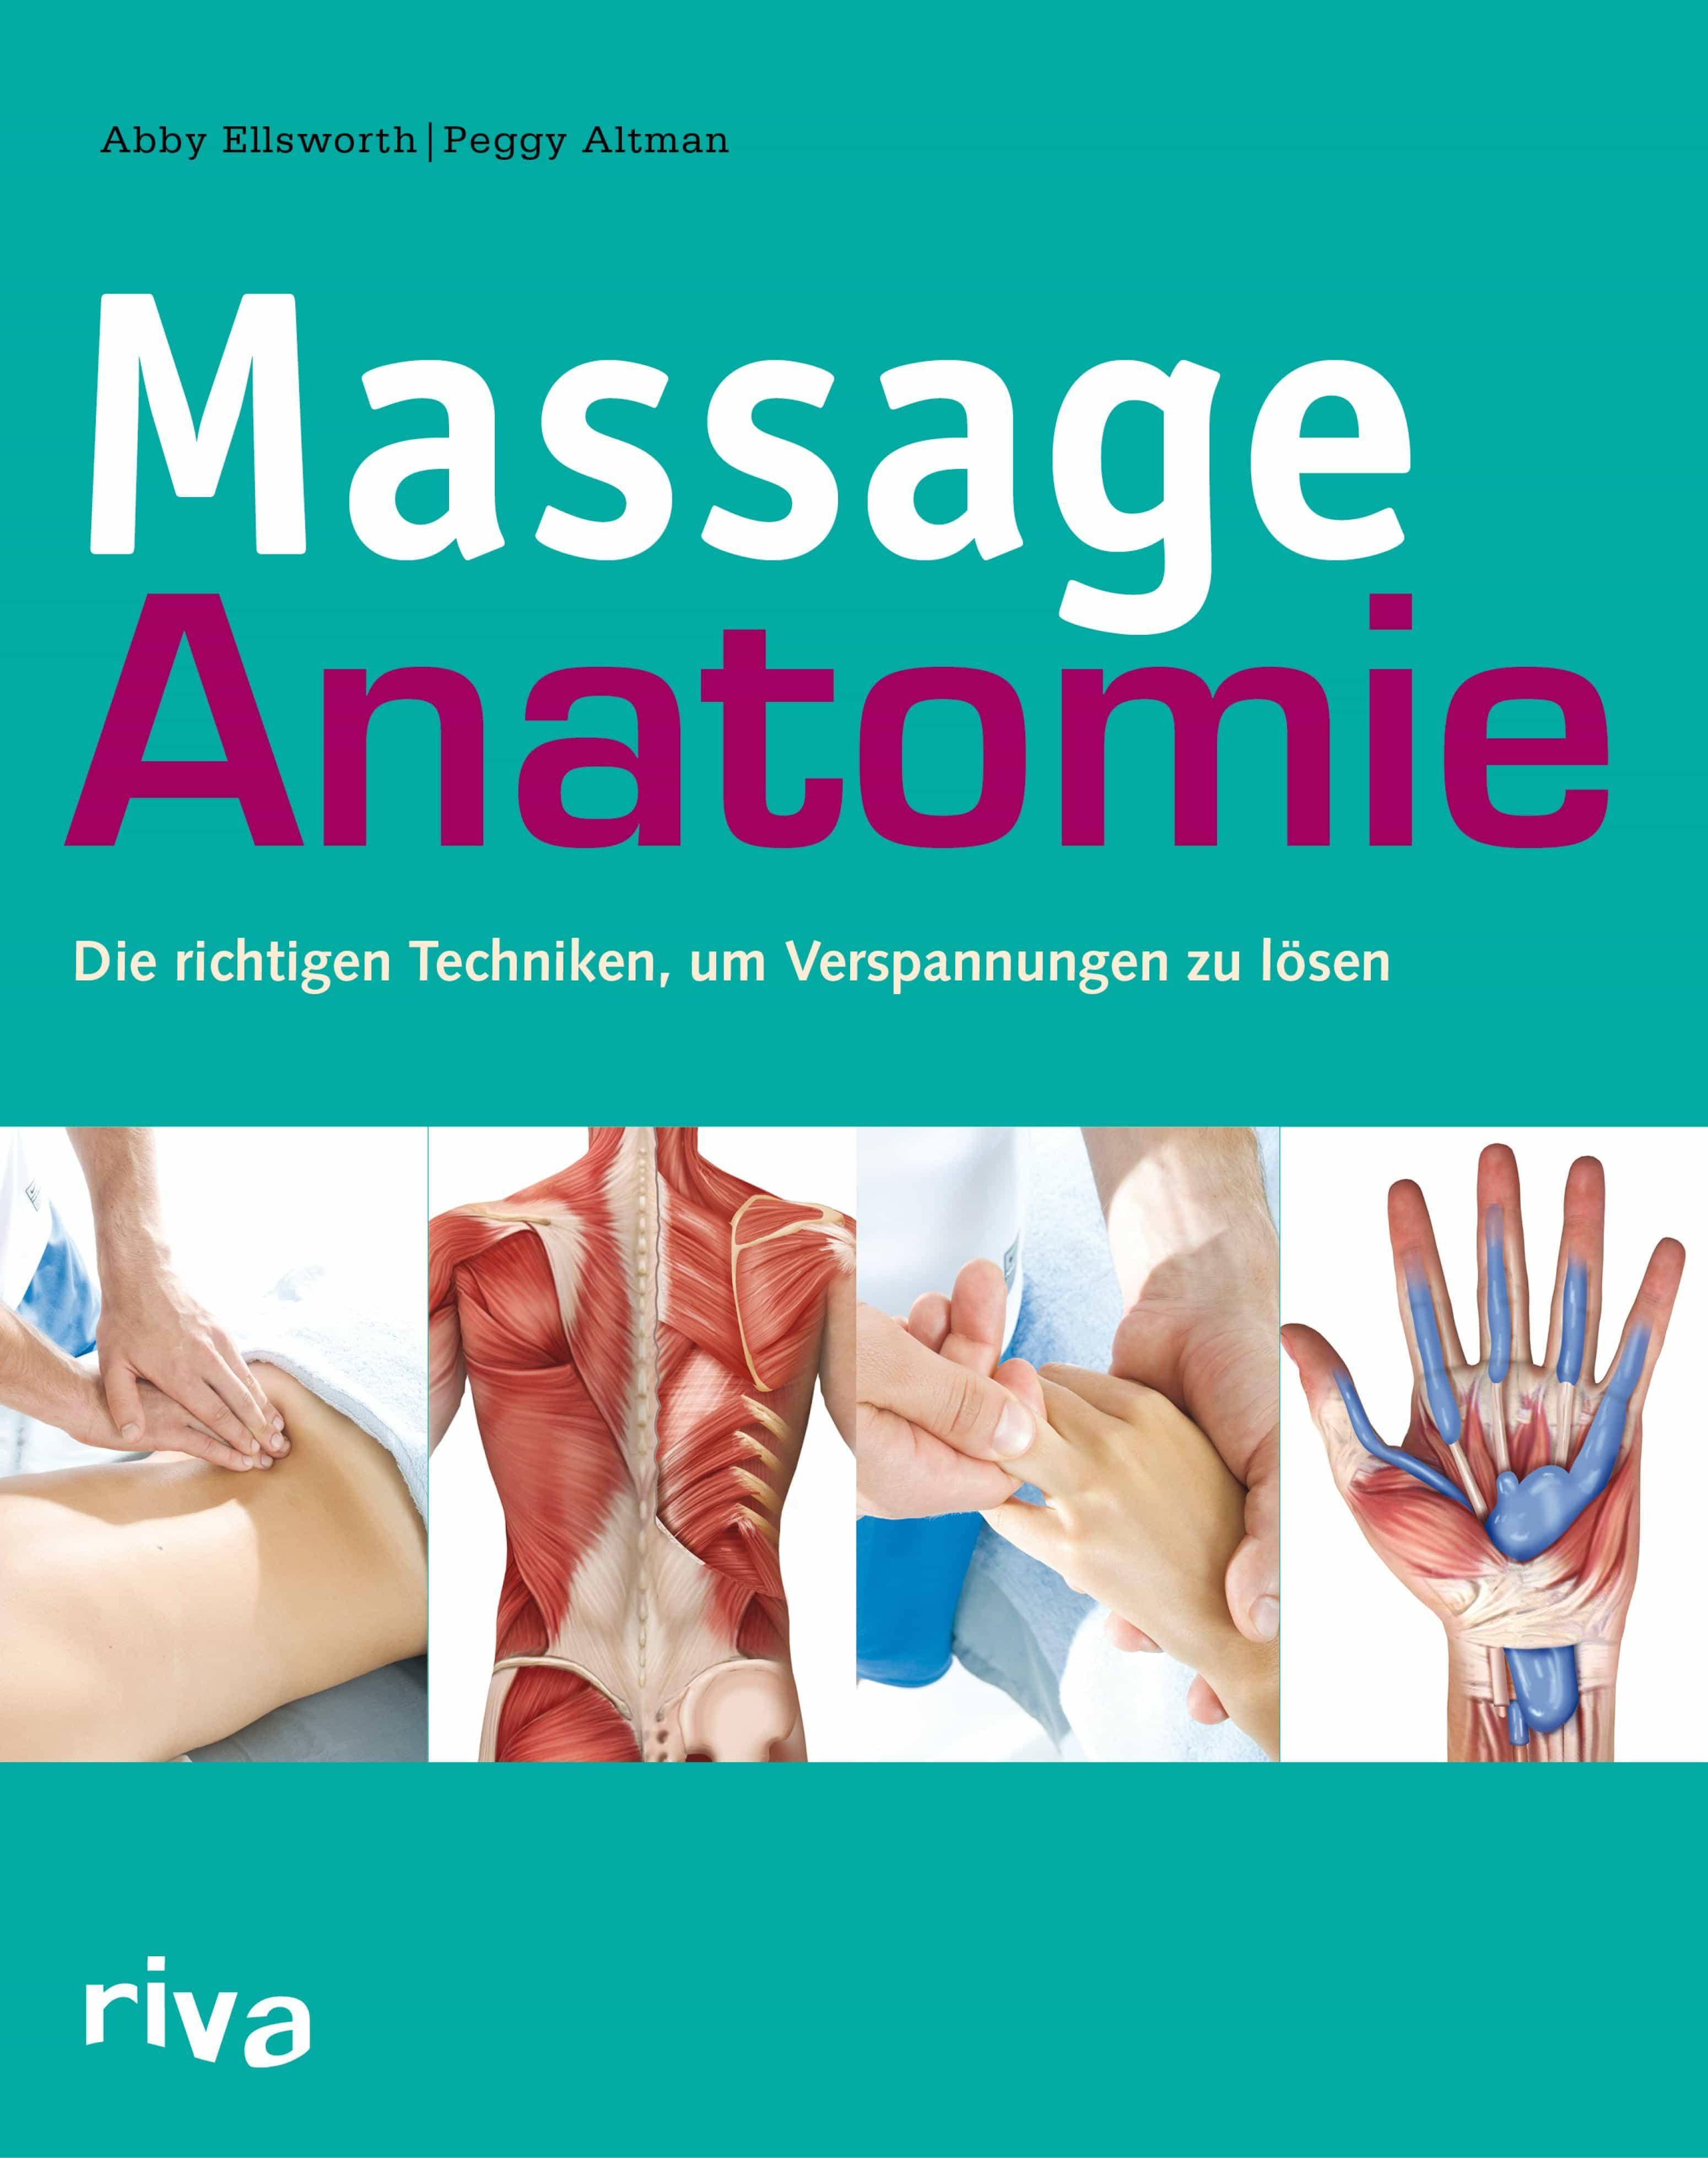 MASSAGE-ANATOMIE EBOOK | ABBY, DR. ELLSWORTH | Descargar libro PDF o ...